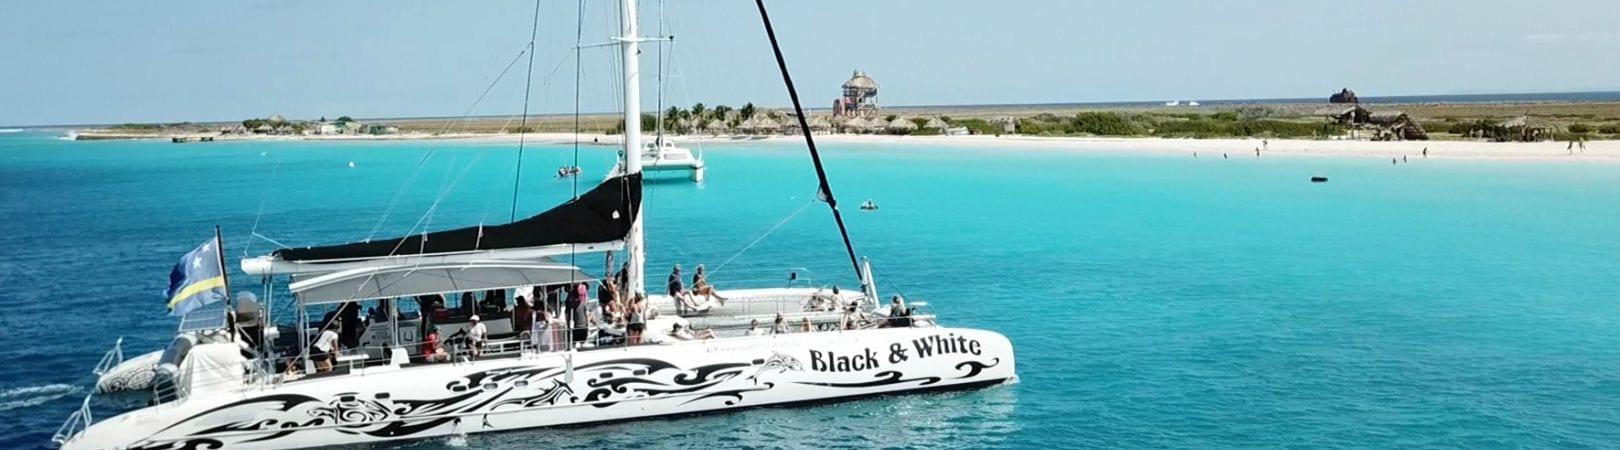 Klein Curaçao met catamaran Black & White